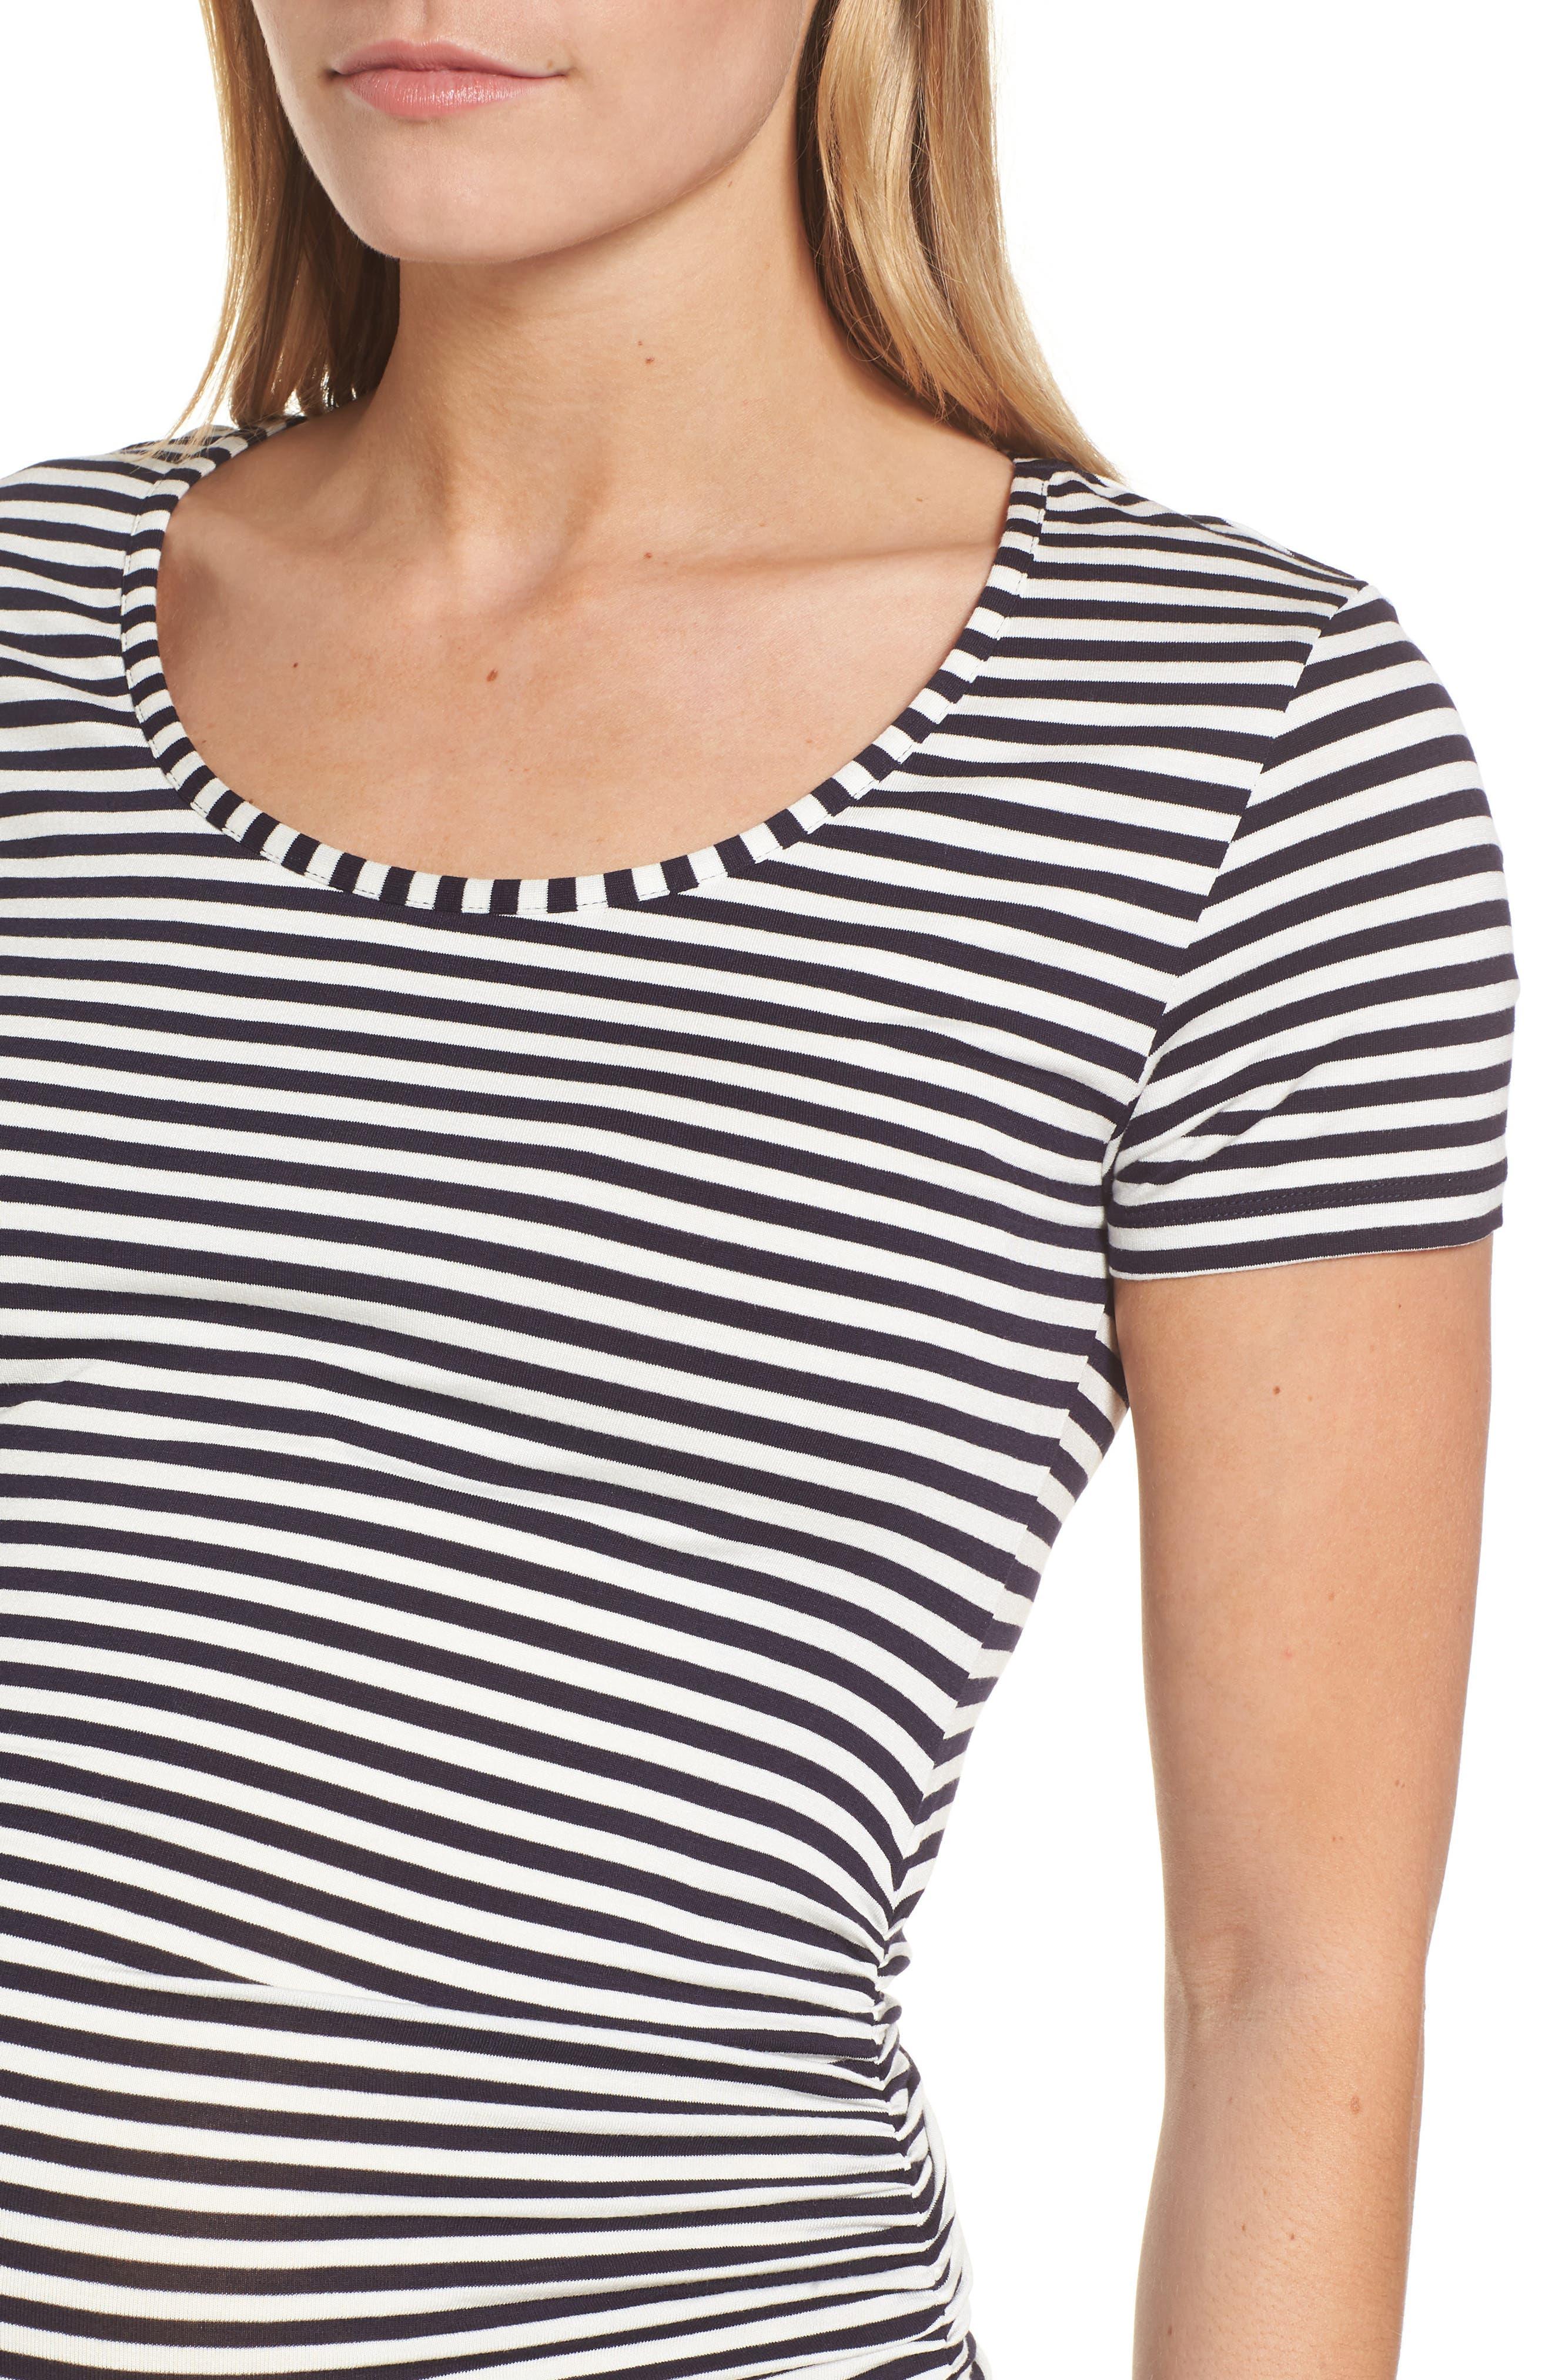 Jenna Maternity Top,                             Alternate thumbnail 4, color,                             Navy/Off White